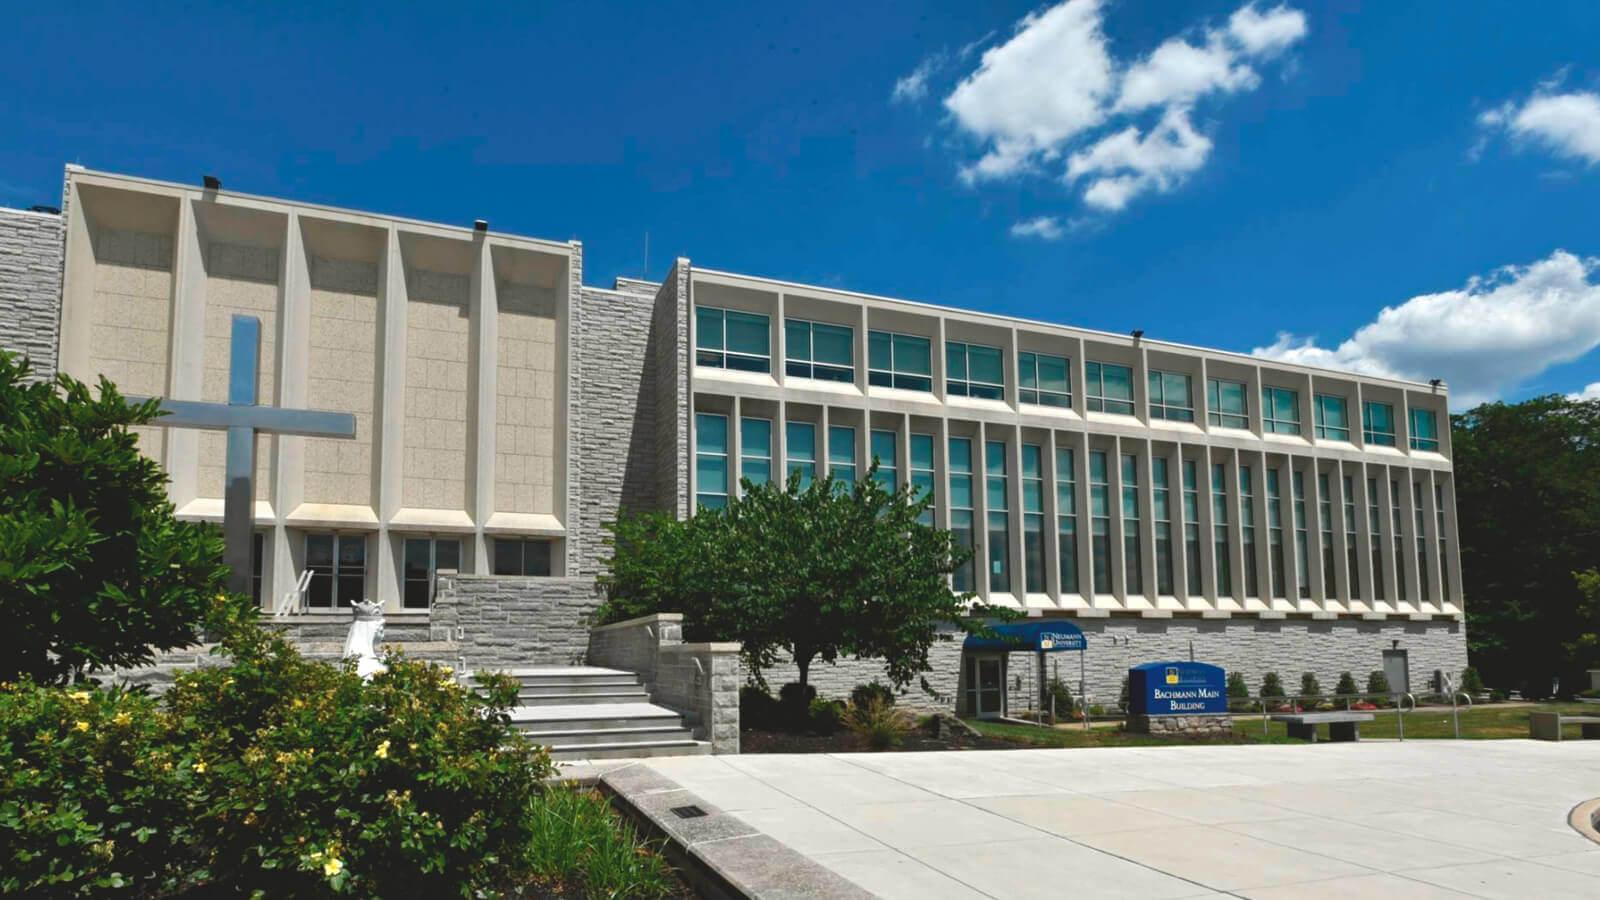 Neumann University Cappex